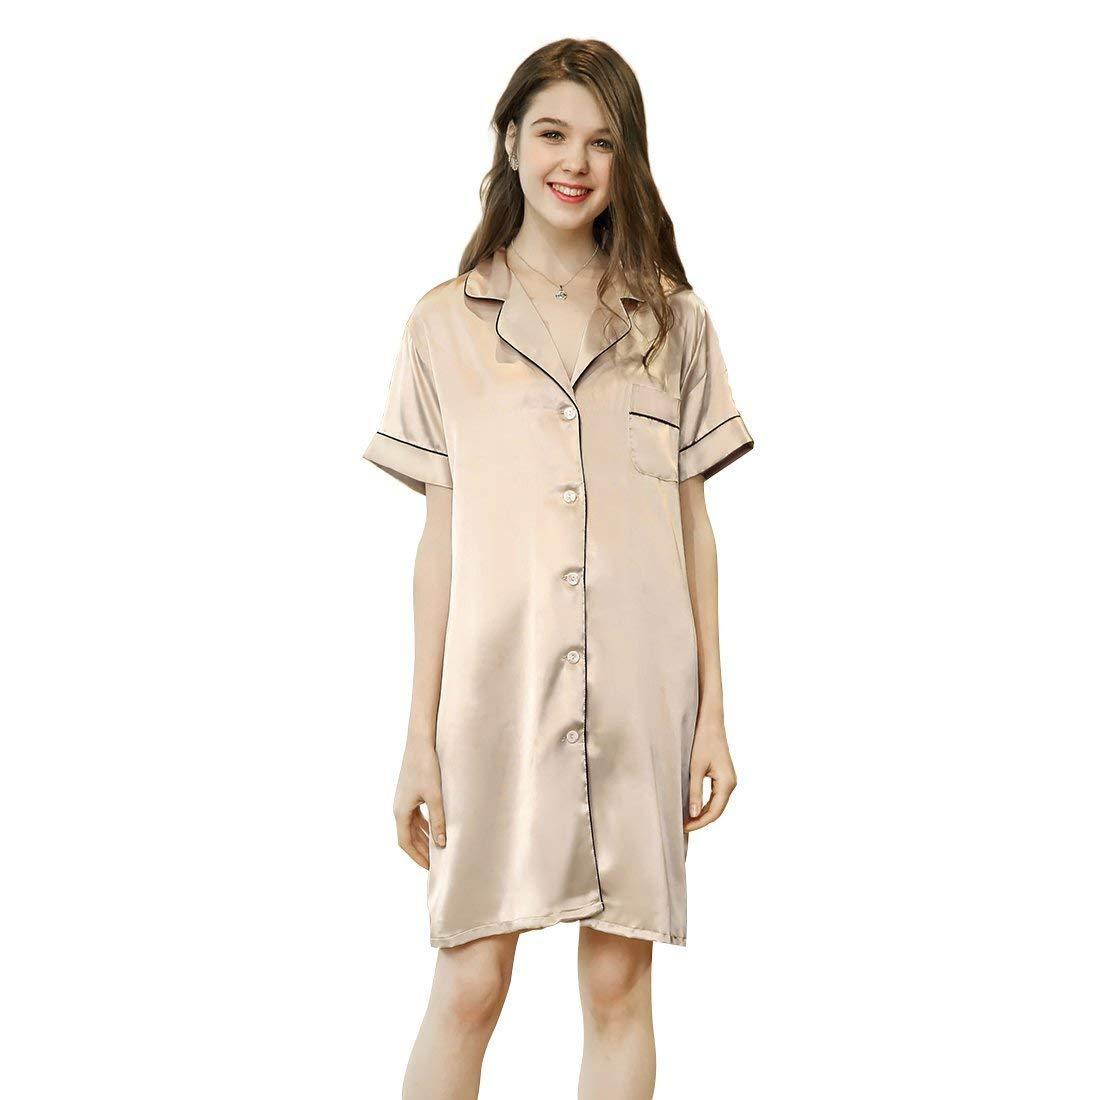 Get Quotations · Slocyclub Soft Silk Pajamas Sexy One-Piece Nighty for Women b0a4dfb95